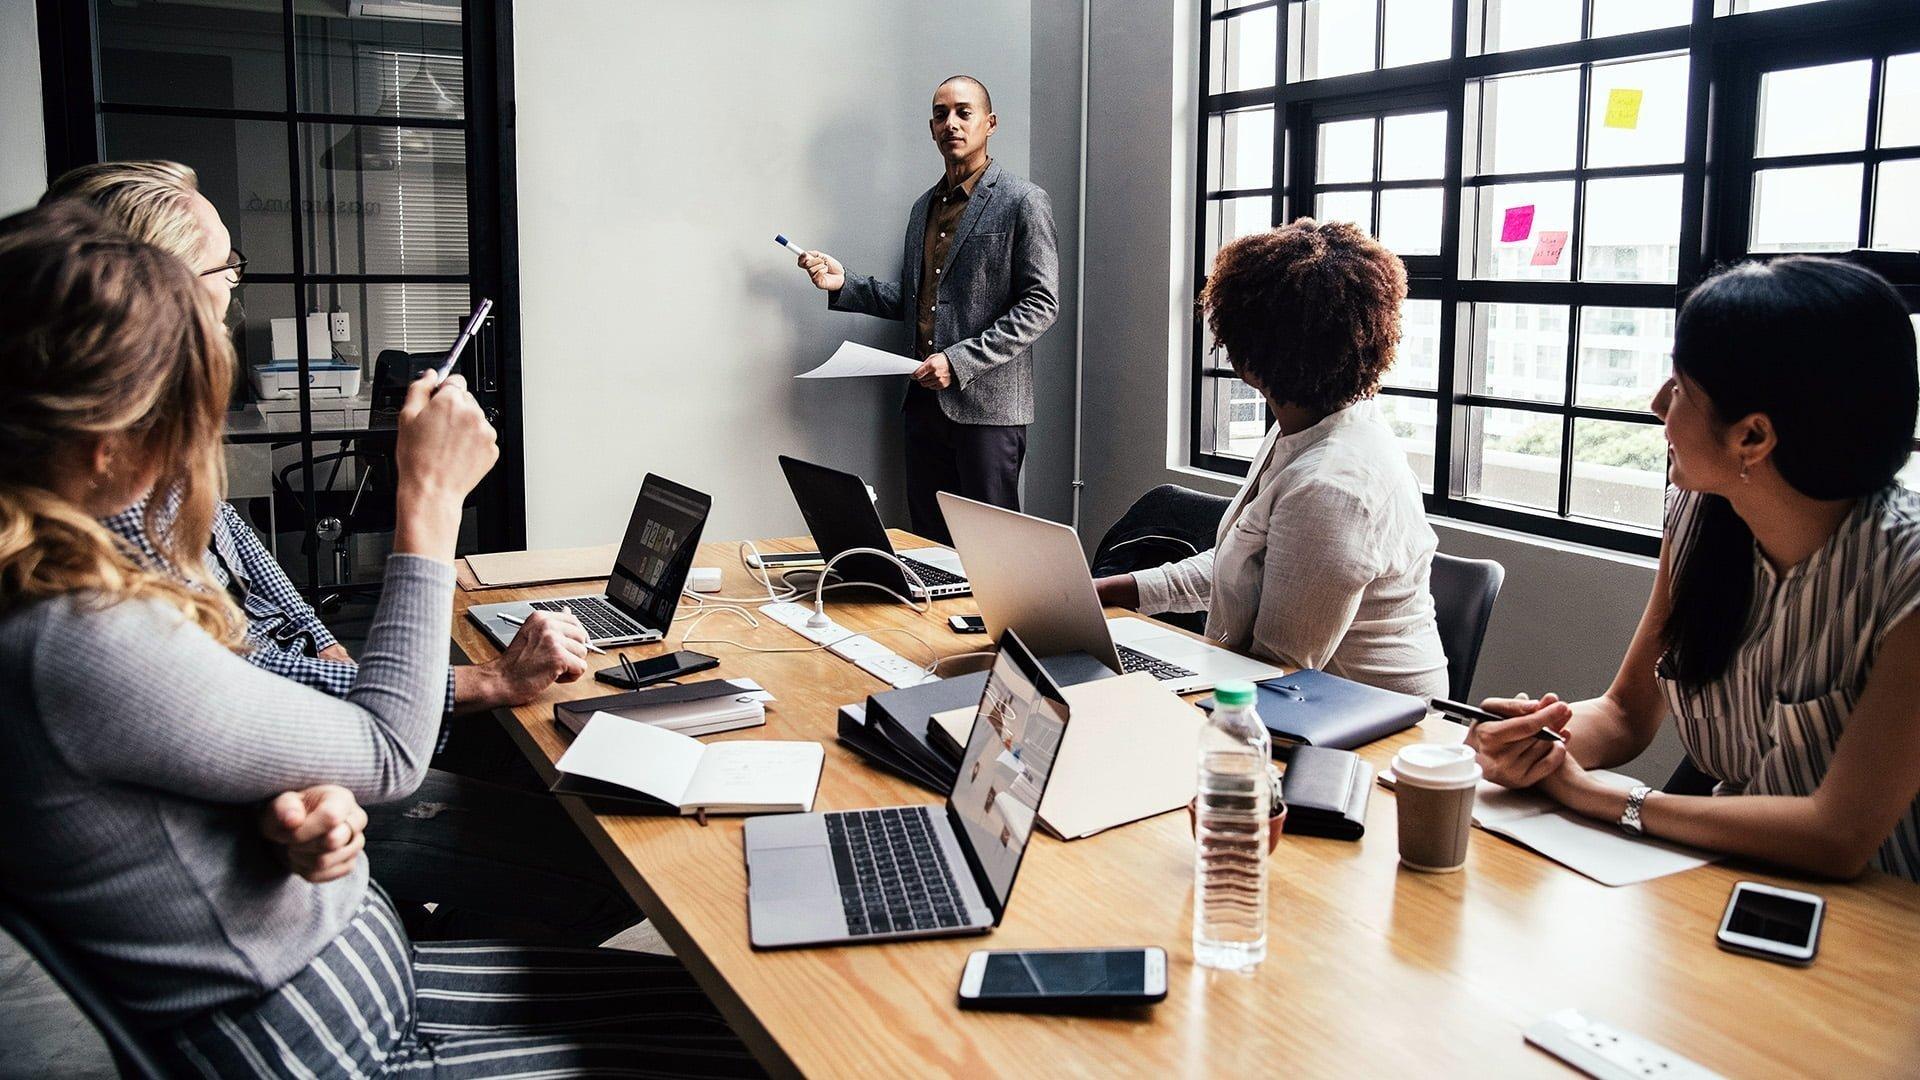 Importance of business leadership skills